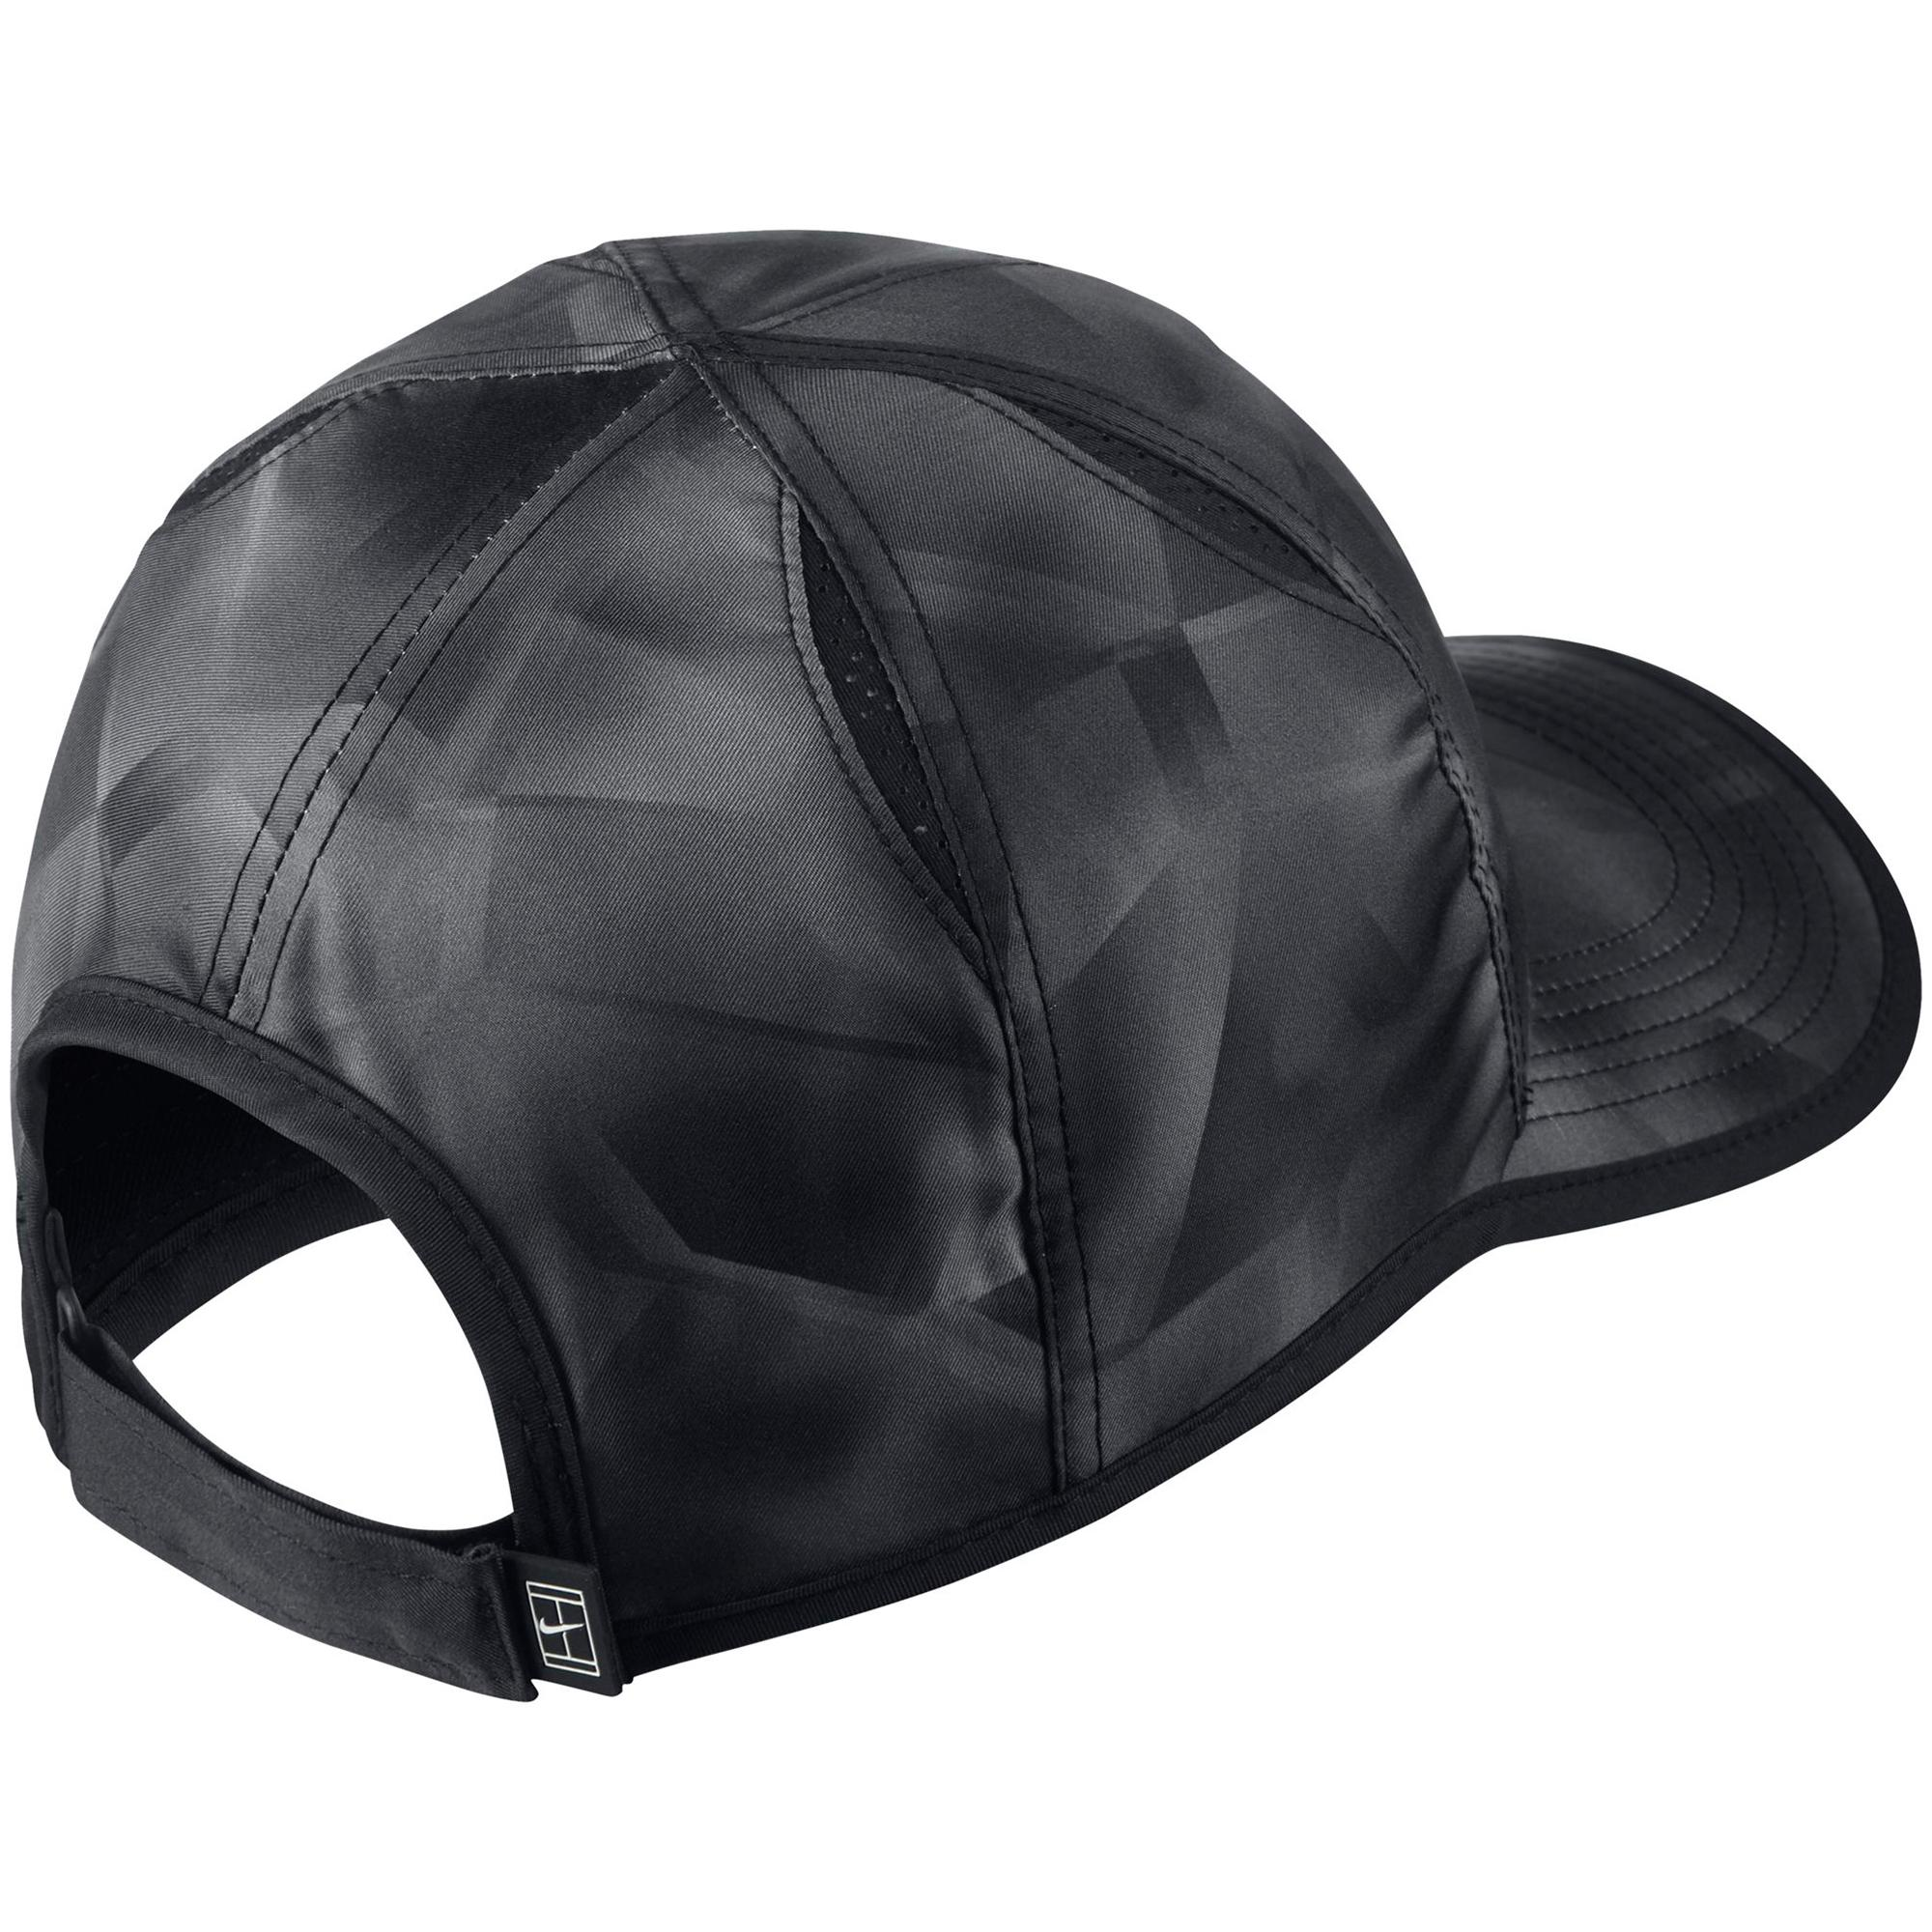 Nike Court AeroBill Tennis Cap - Black White - Tennisnuts.com f2d50569e00